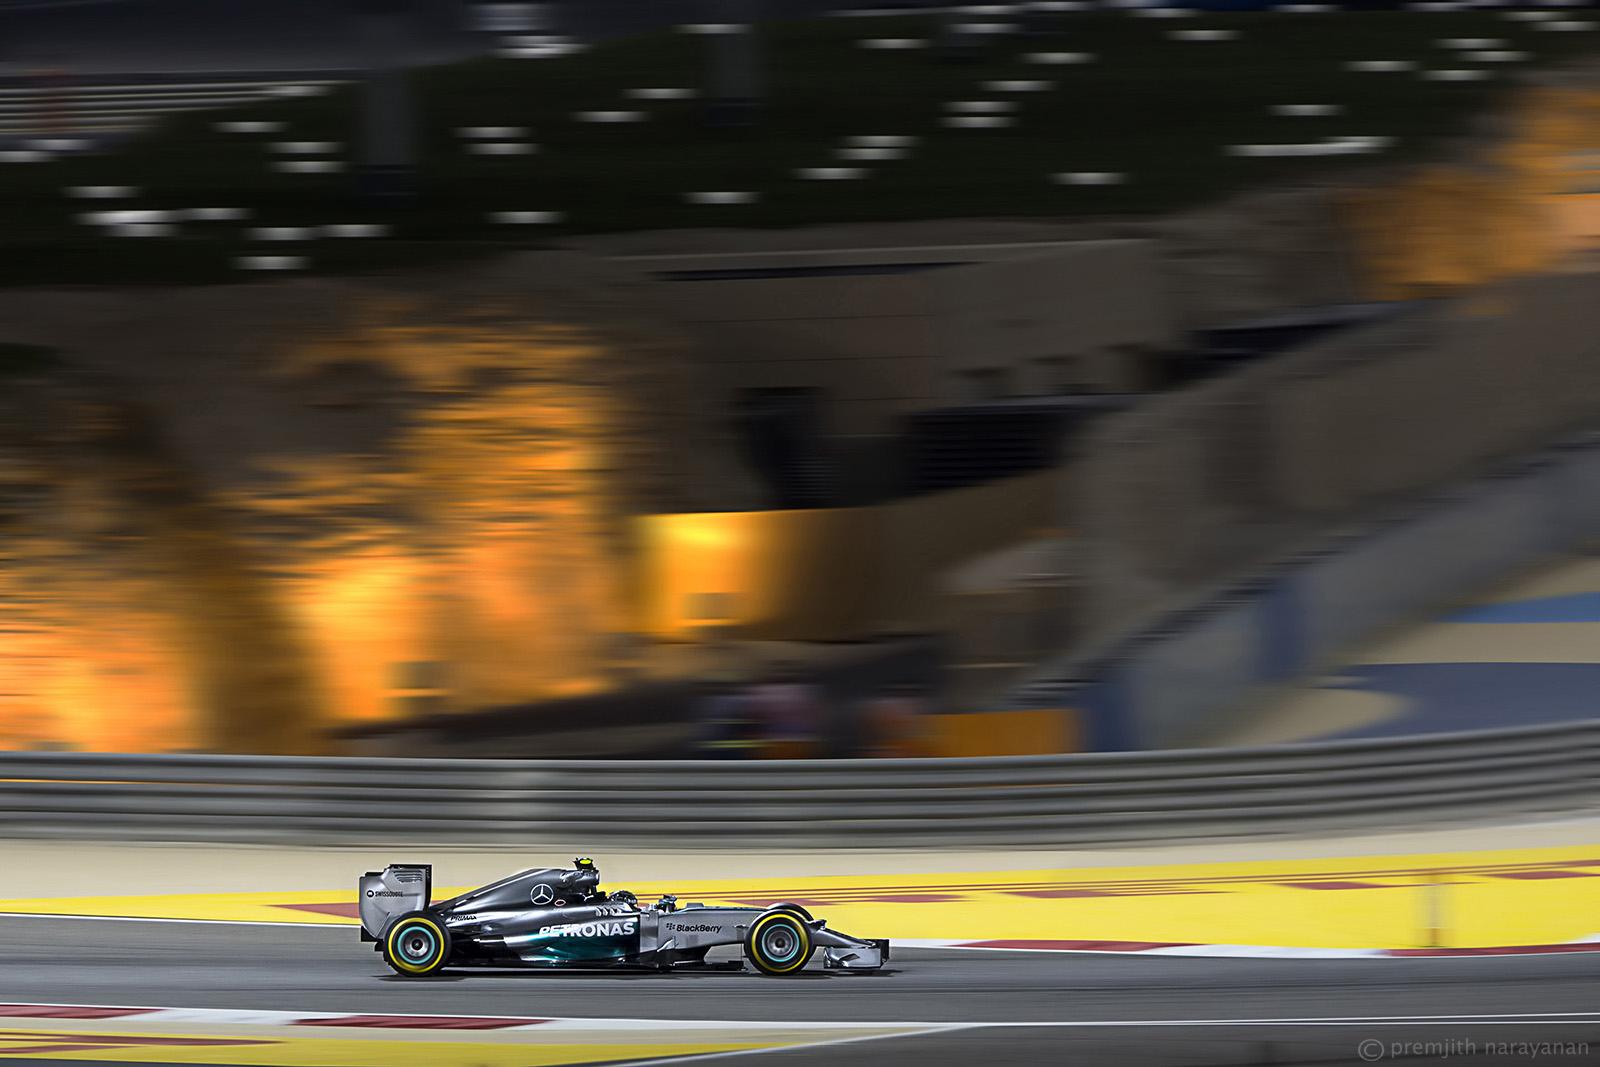 Nico Roseberg, MERCEDES AMG Petronas